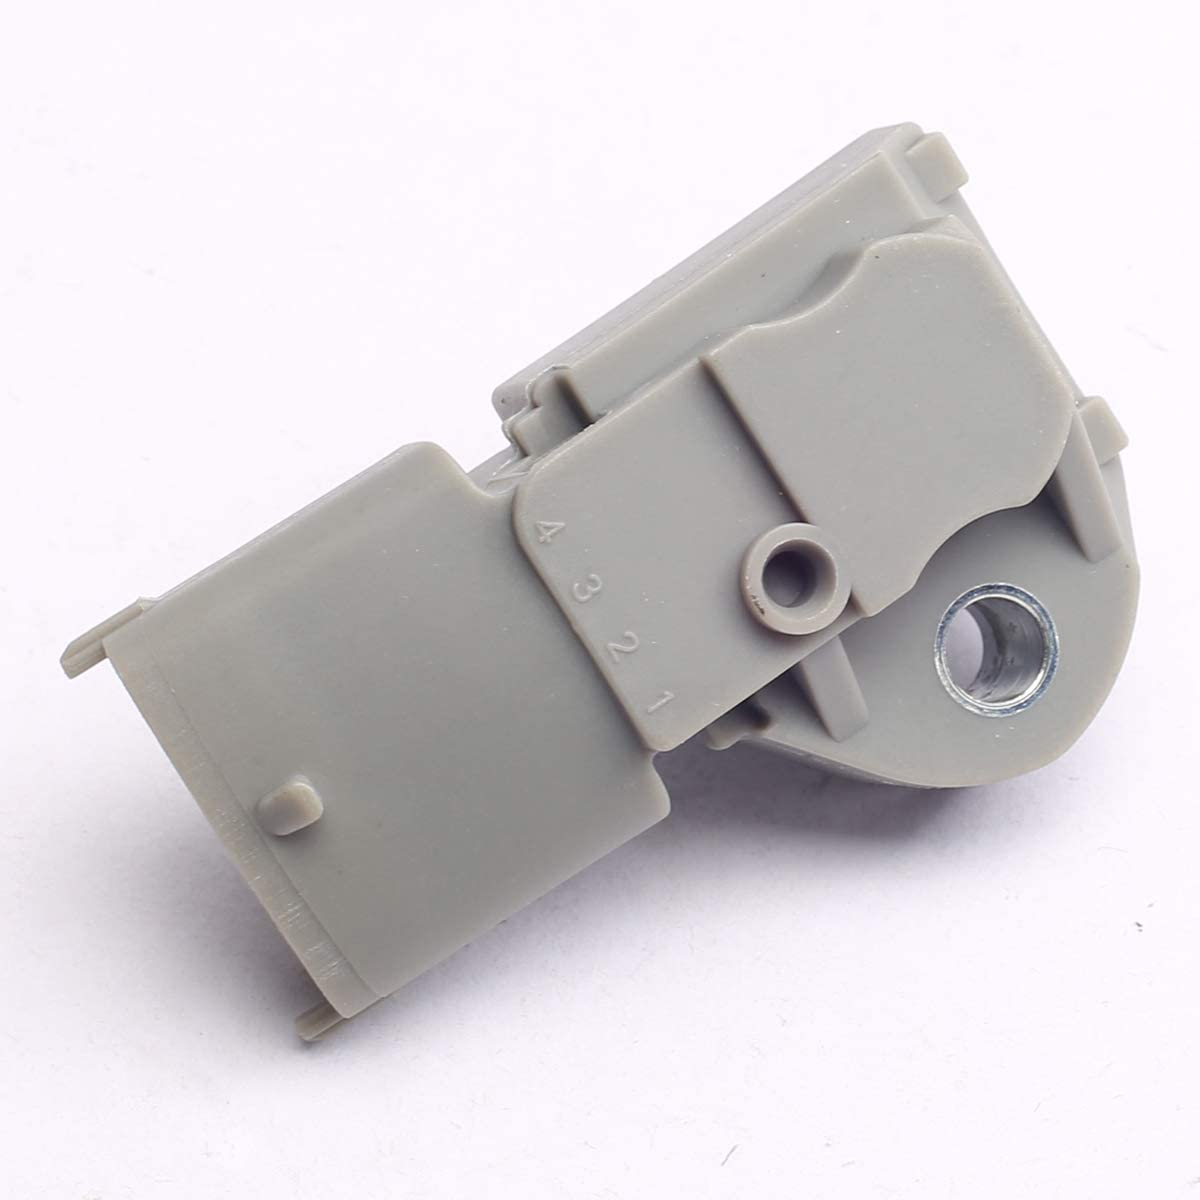 Volvo S60 S80 V70 XC70 XC90 C30 Fuel Pressure Sensor Fuel Rail 31272730 BOSCH